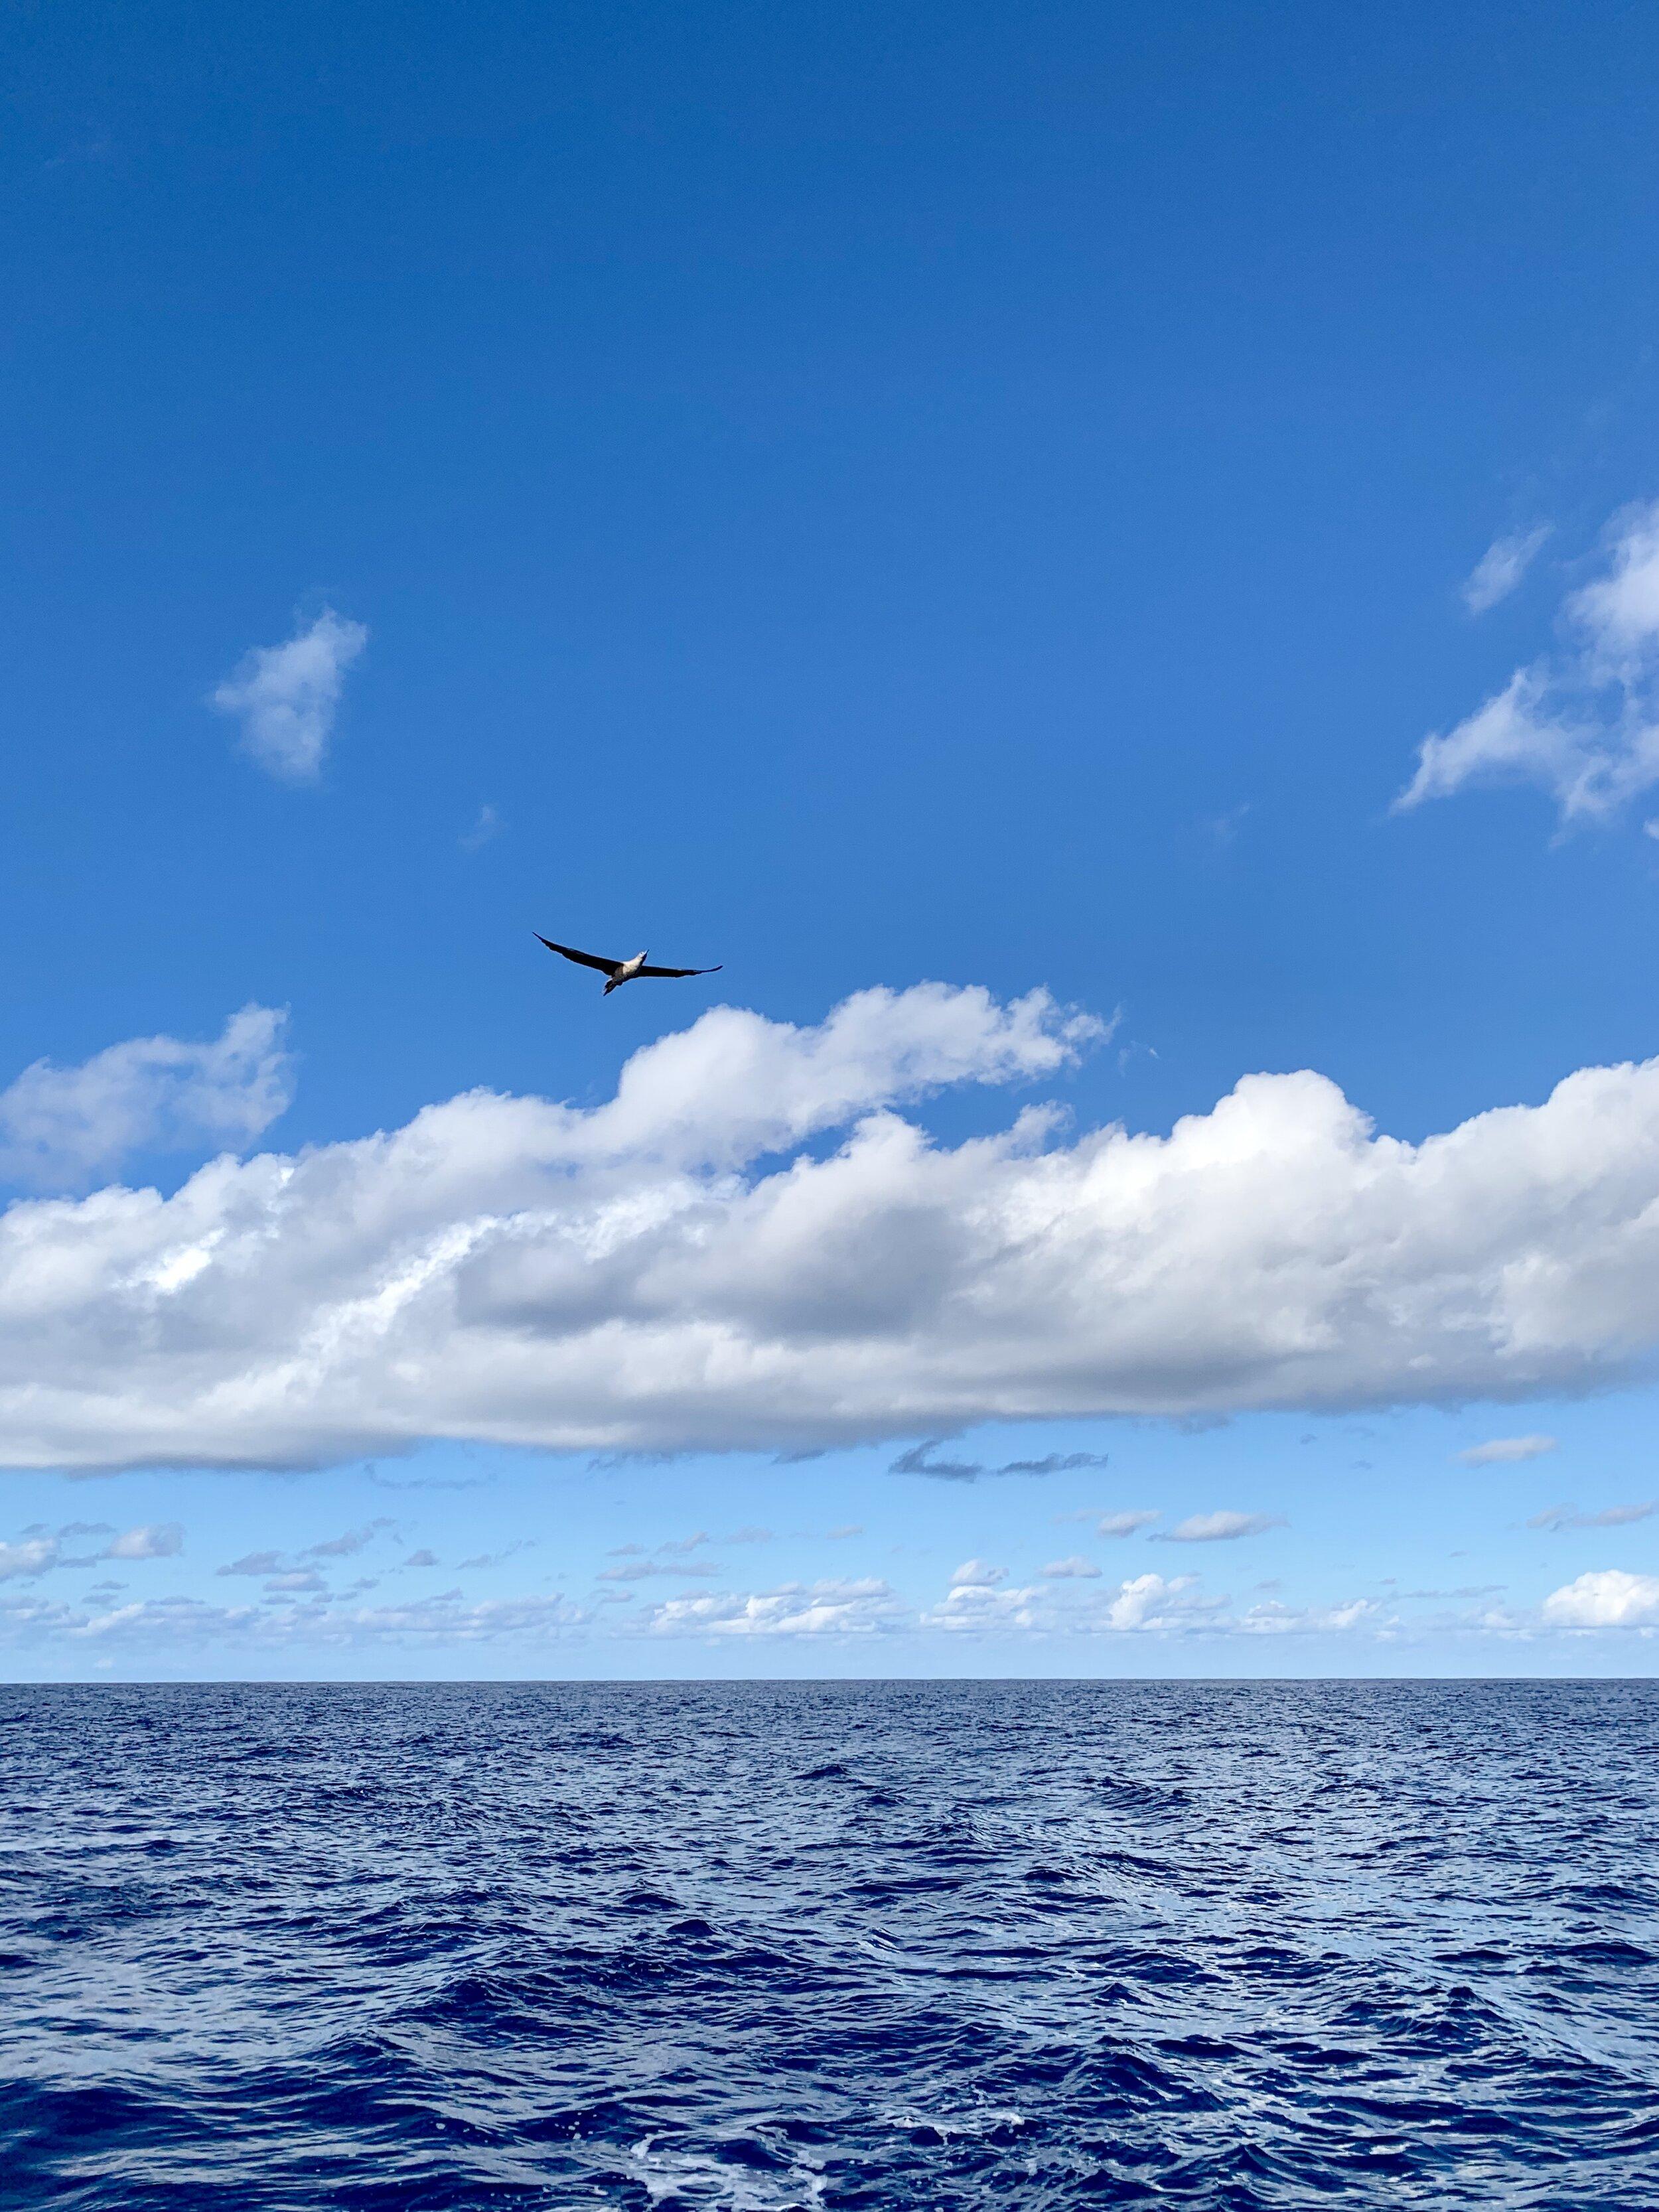 bluewaterbirdflying